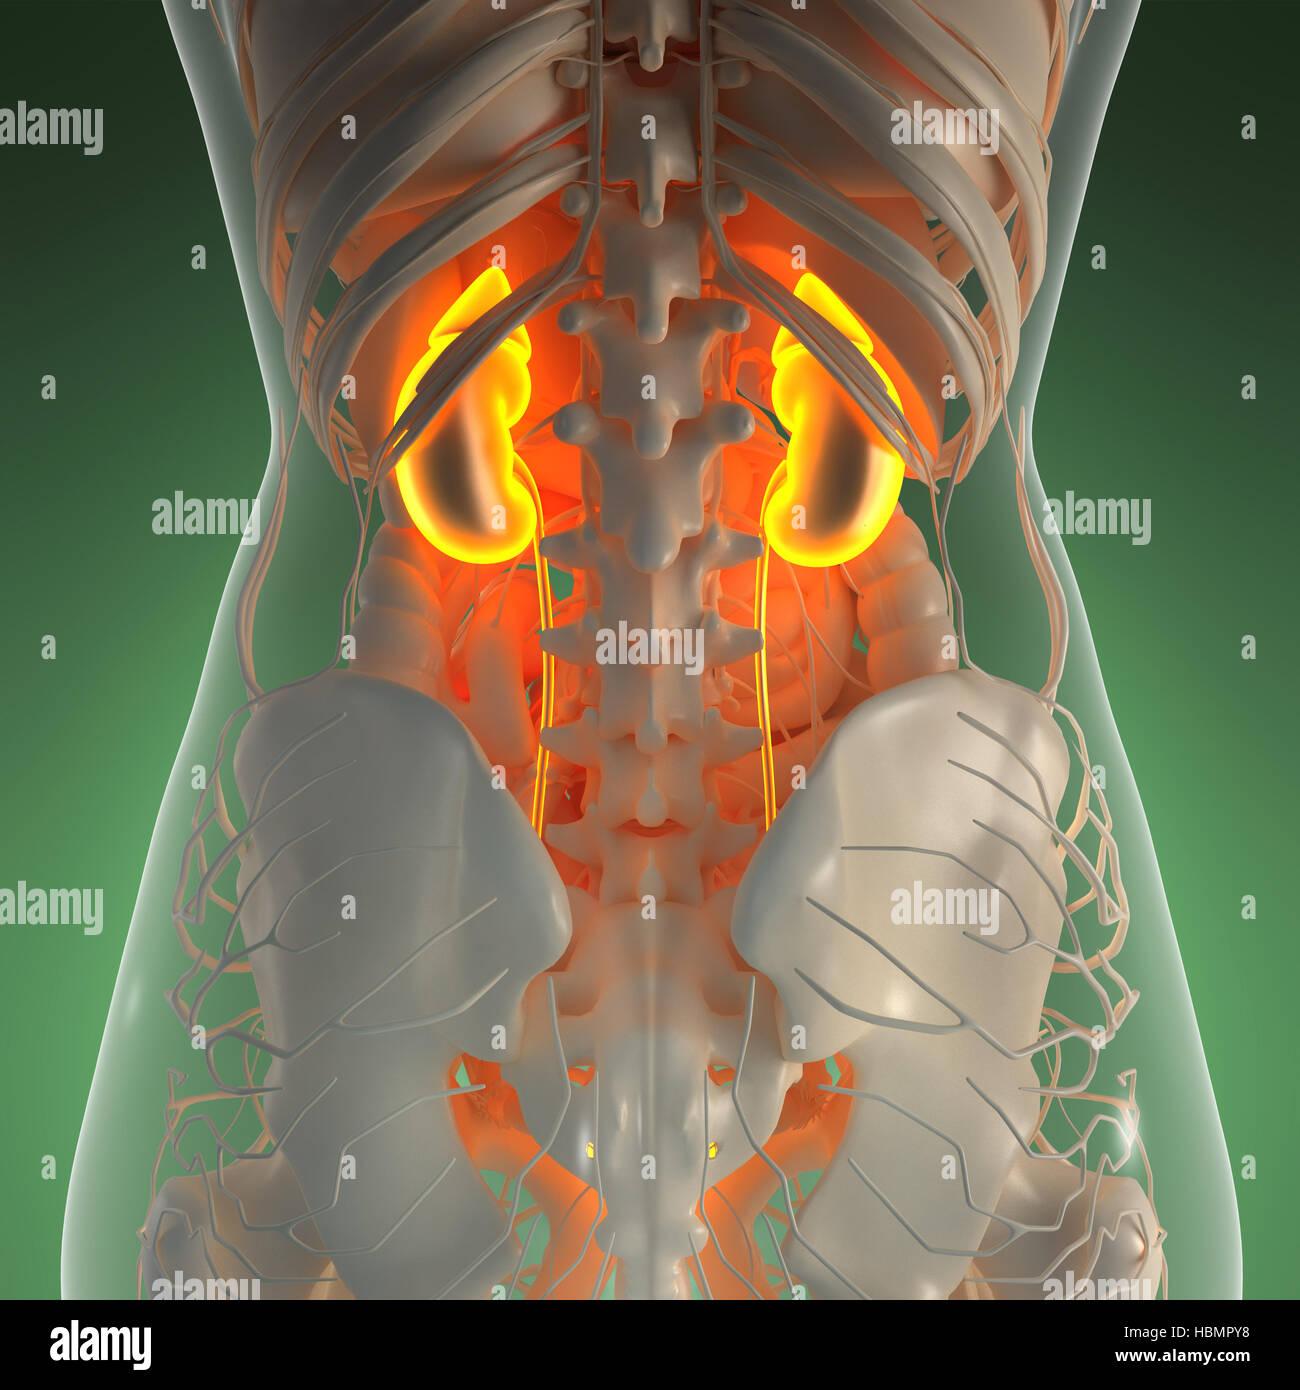 Kidney X Ray Imágenes De Stock & Kidney X Ray Fotos De Stock - Alamy